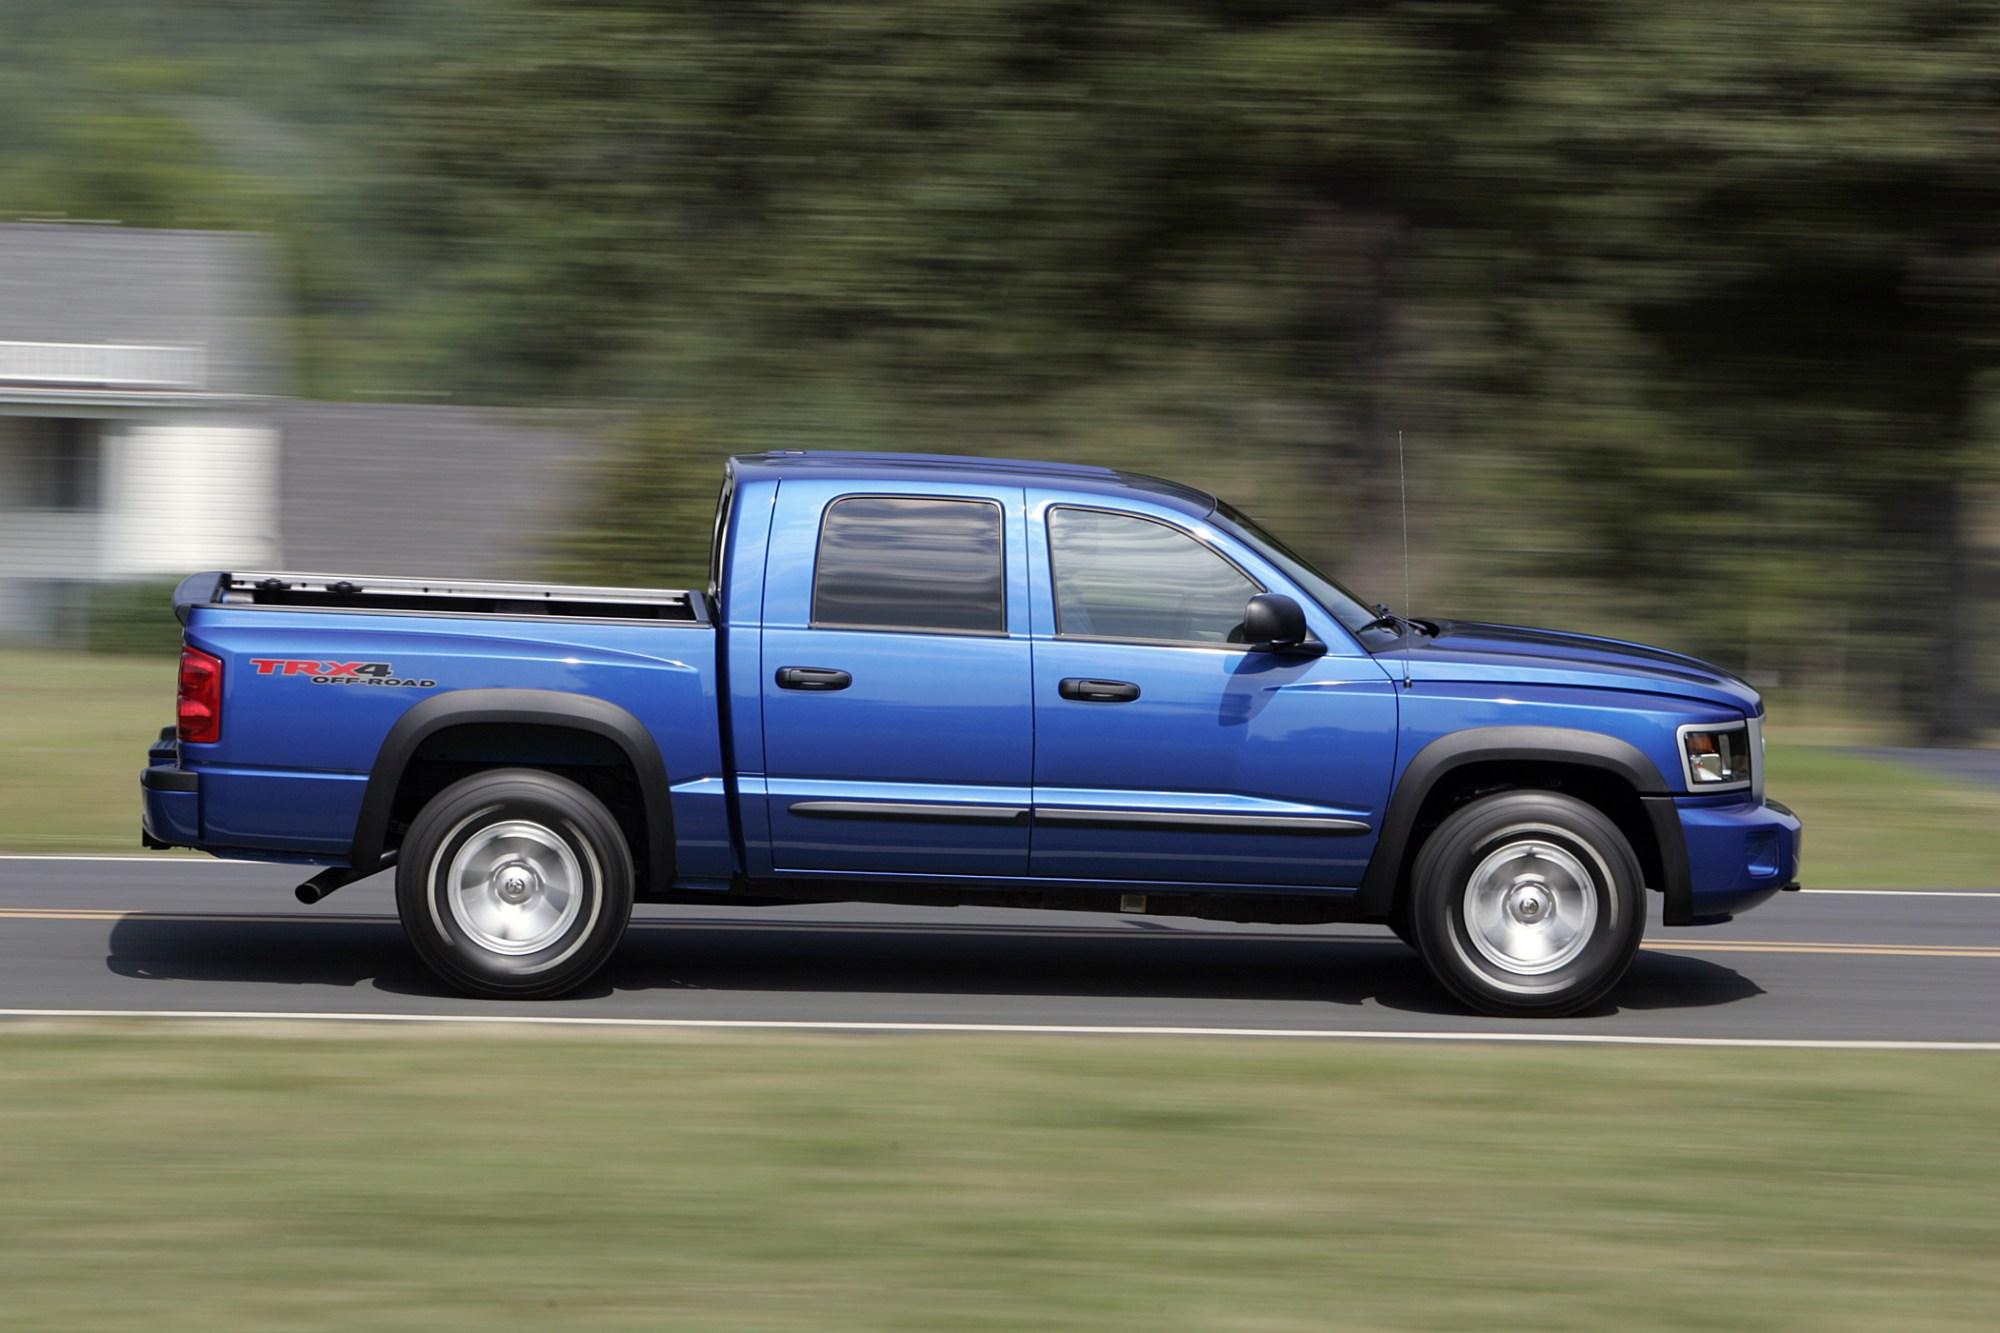 hight resolution of manufacturer photo dodge s 2010 dakota trx4 4x4 crew cab pickup is off road